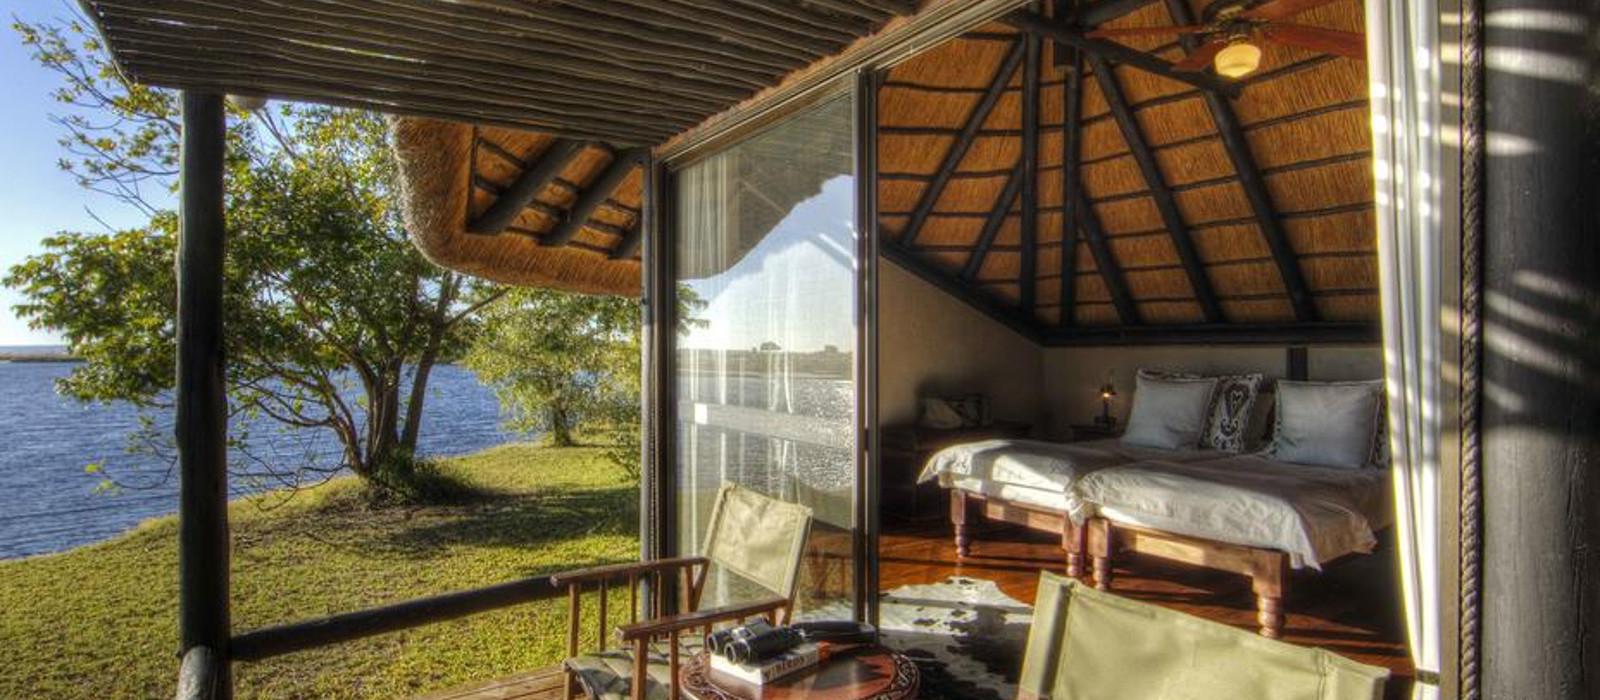 Hotel Chobe Savanna Lodge Botswana